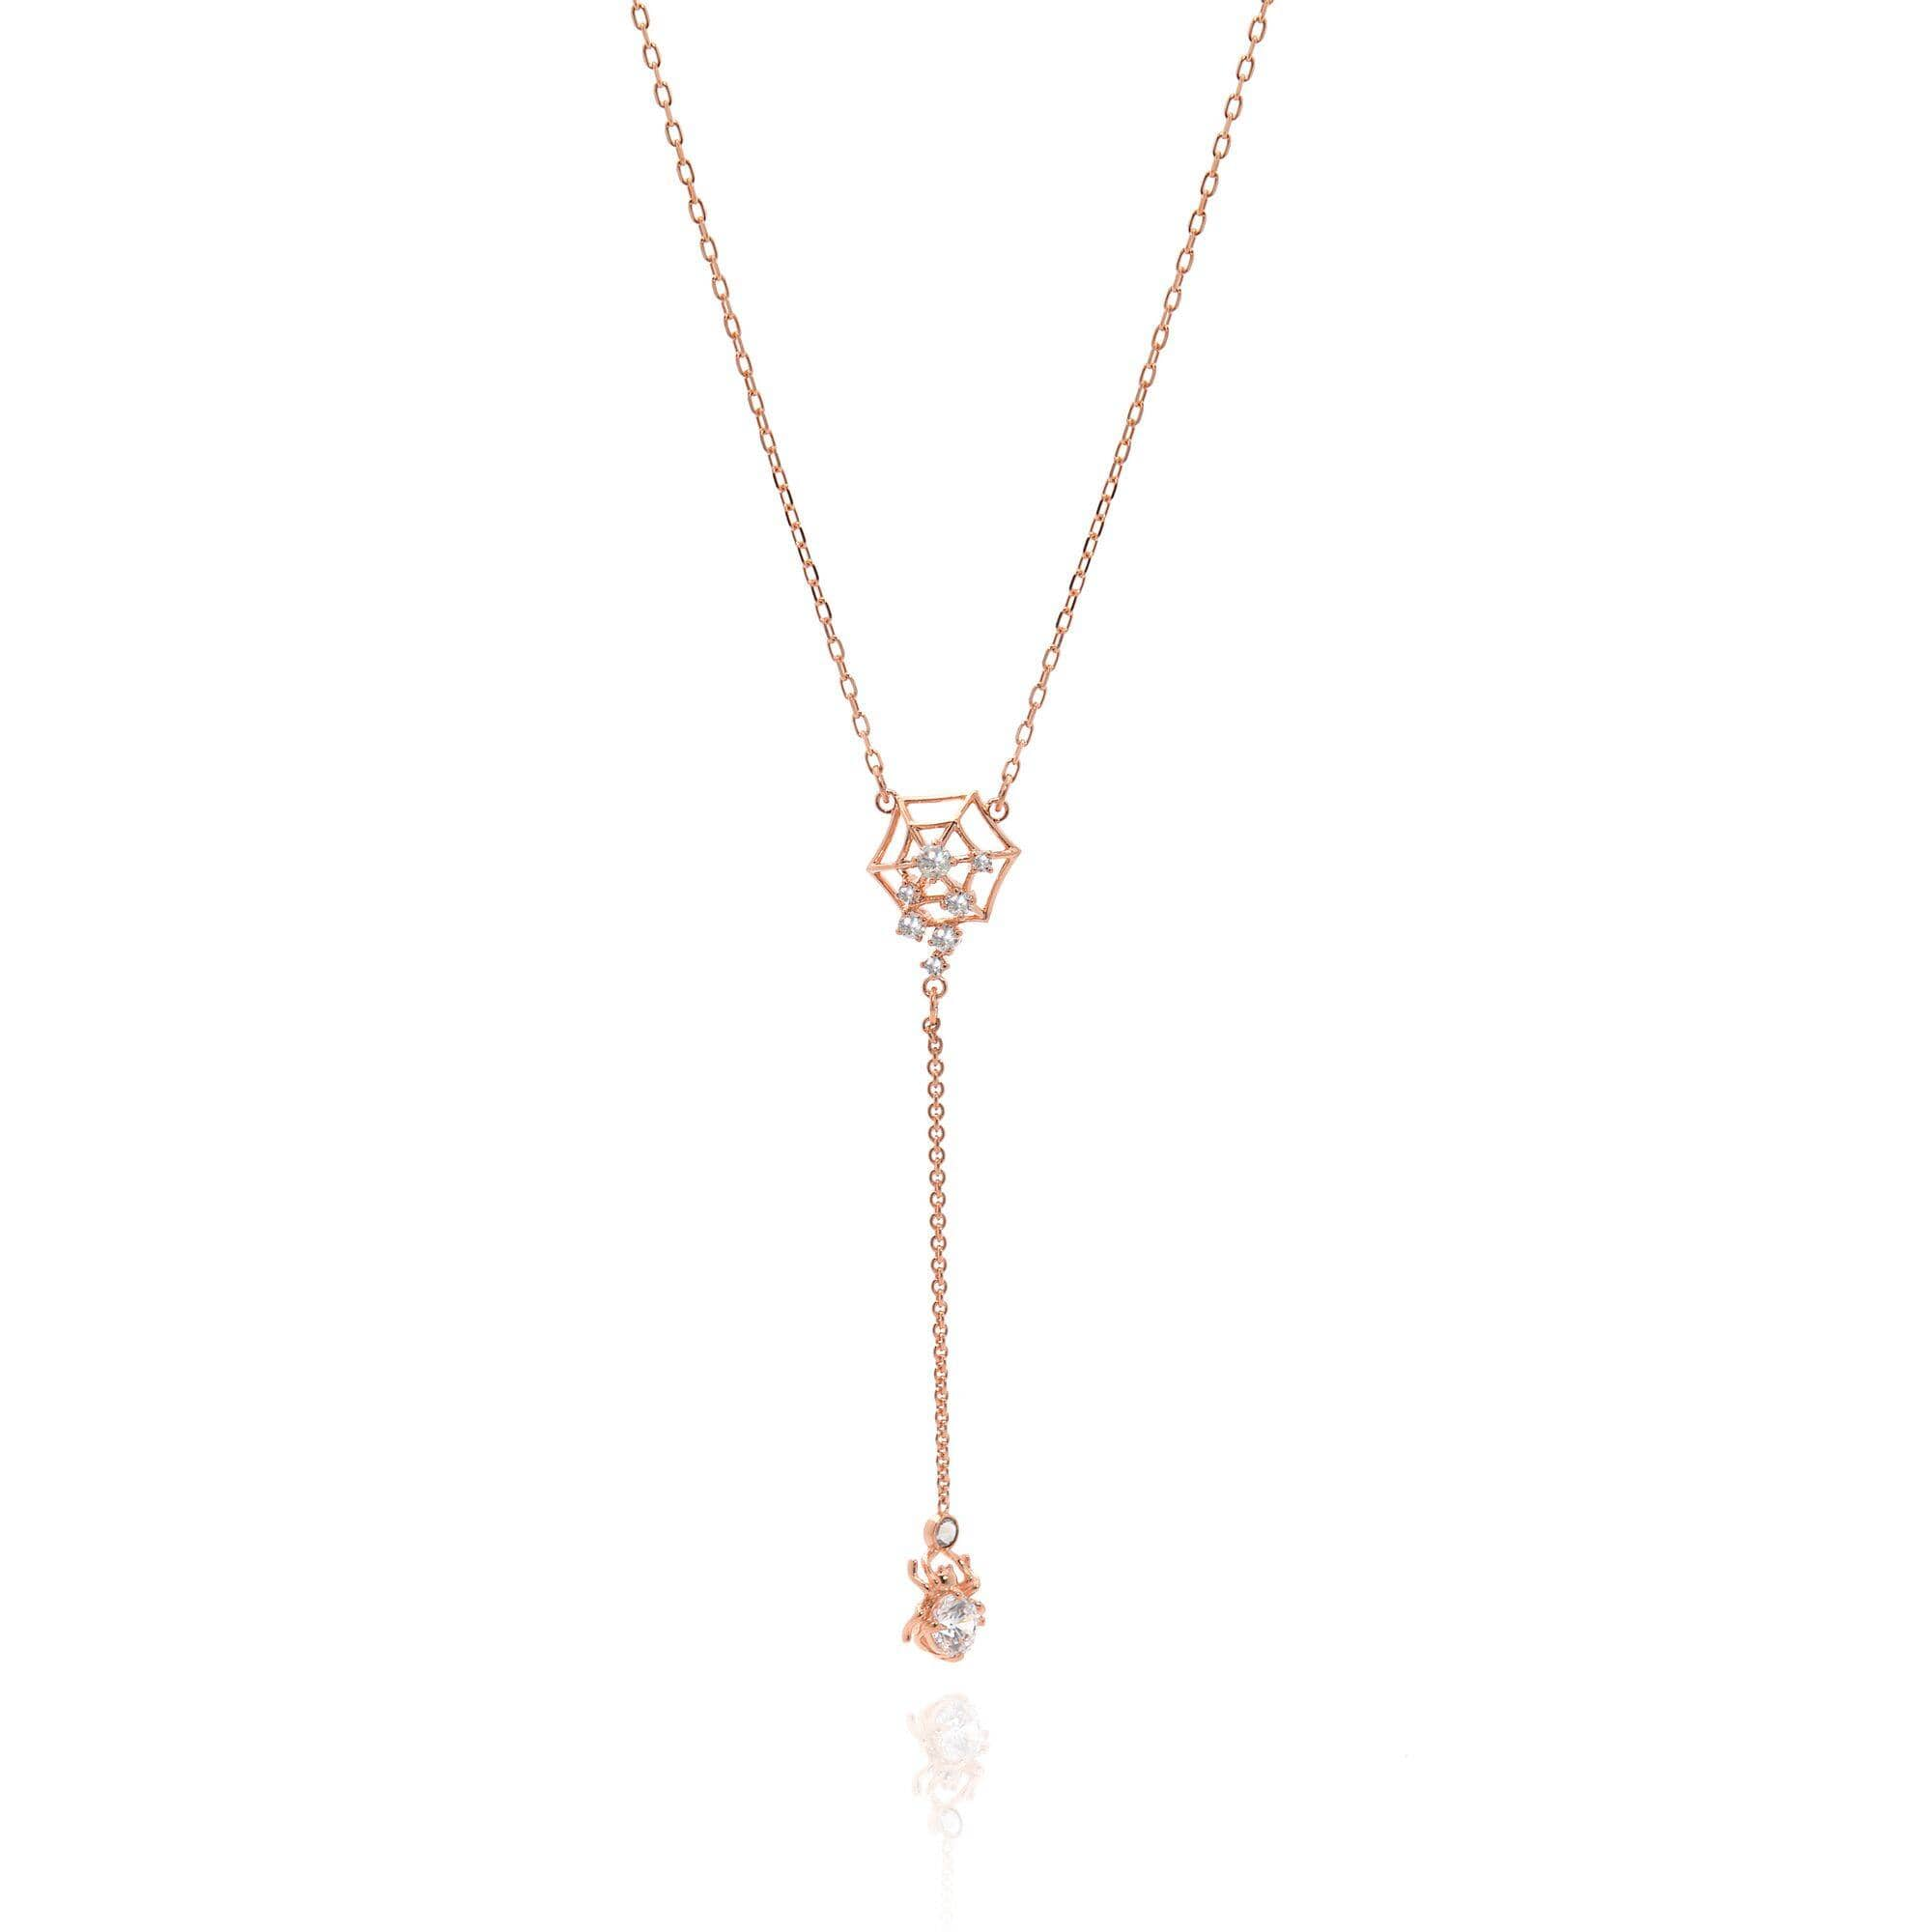 Swarovski Rose Gold Tone Necklace $29 + FS